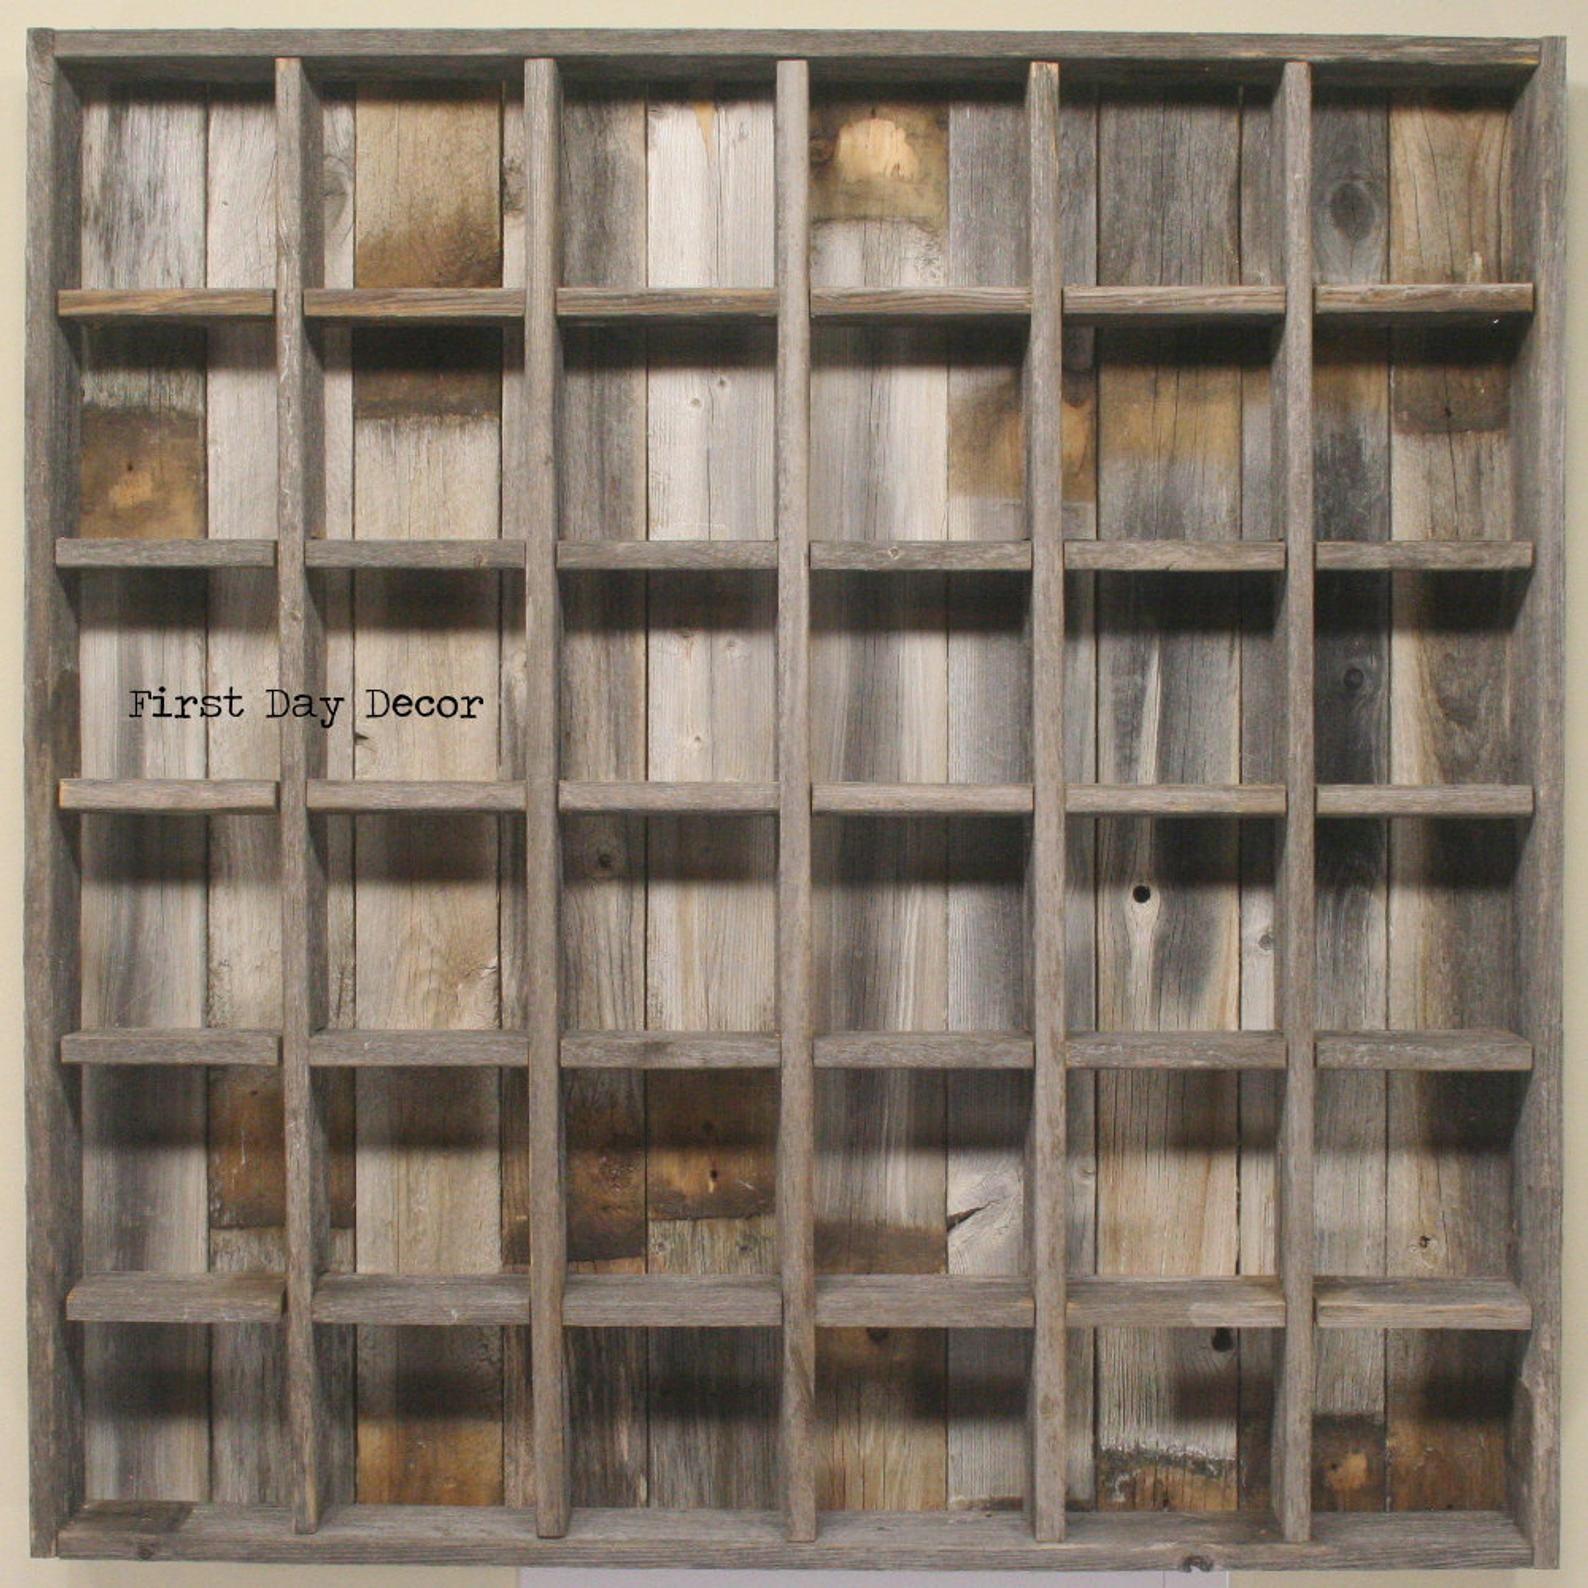 Wood Cubby Grande 36 Cubbyhole Cubby Shelf Wall Decor Etsy Wood Cubby Aging Wood Cubby Shelves